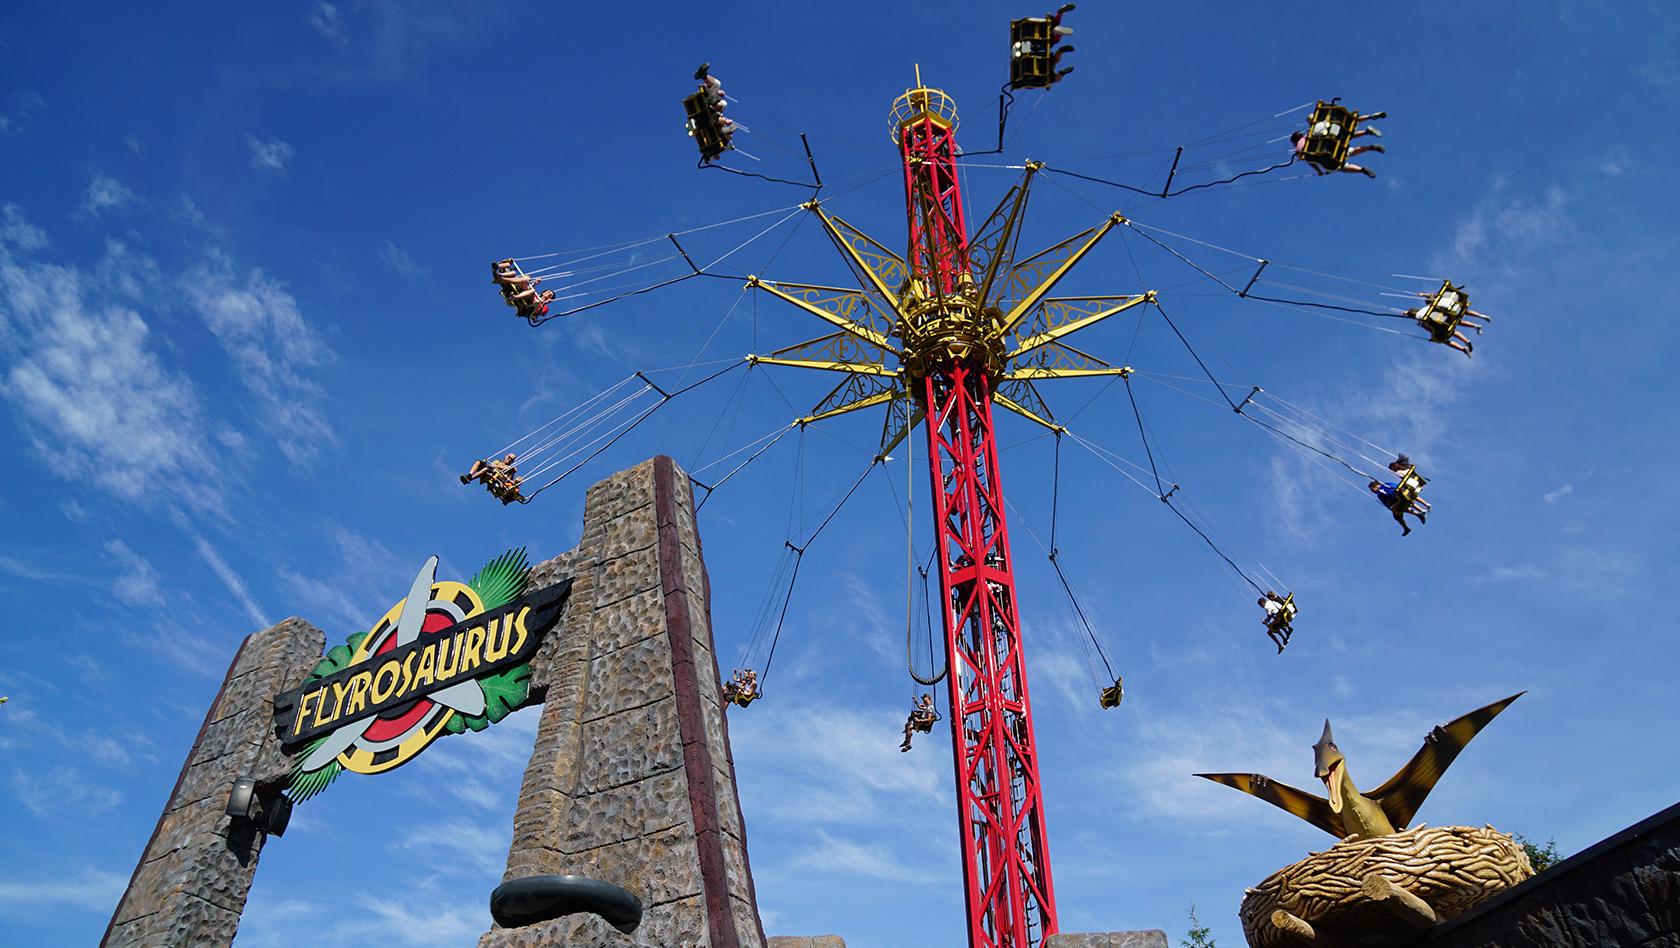 [Babyland Amiland] 2021, swing tower sbf vista